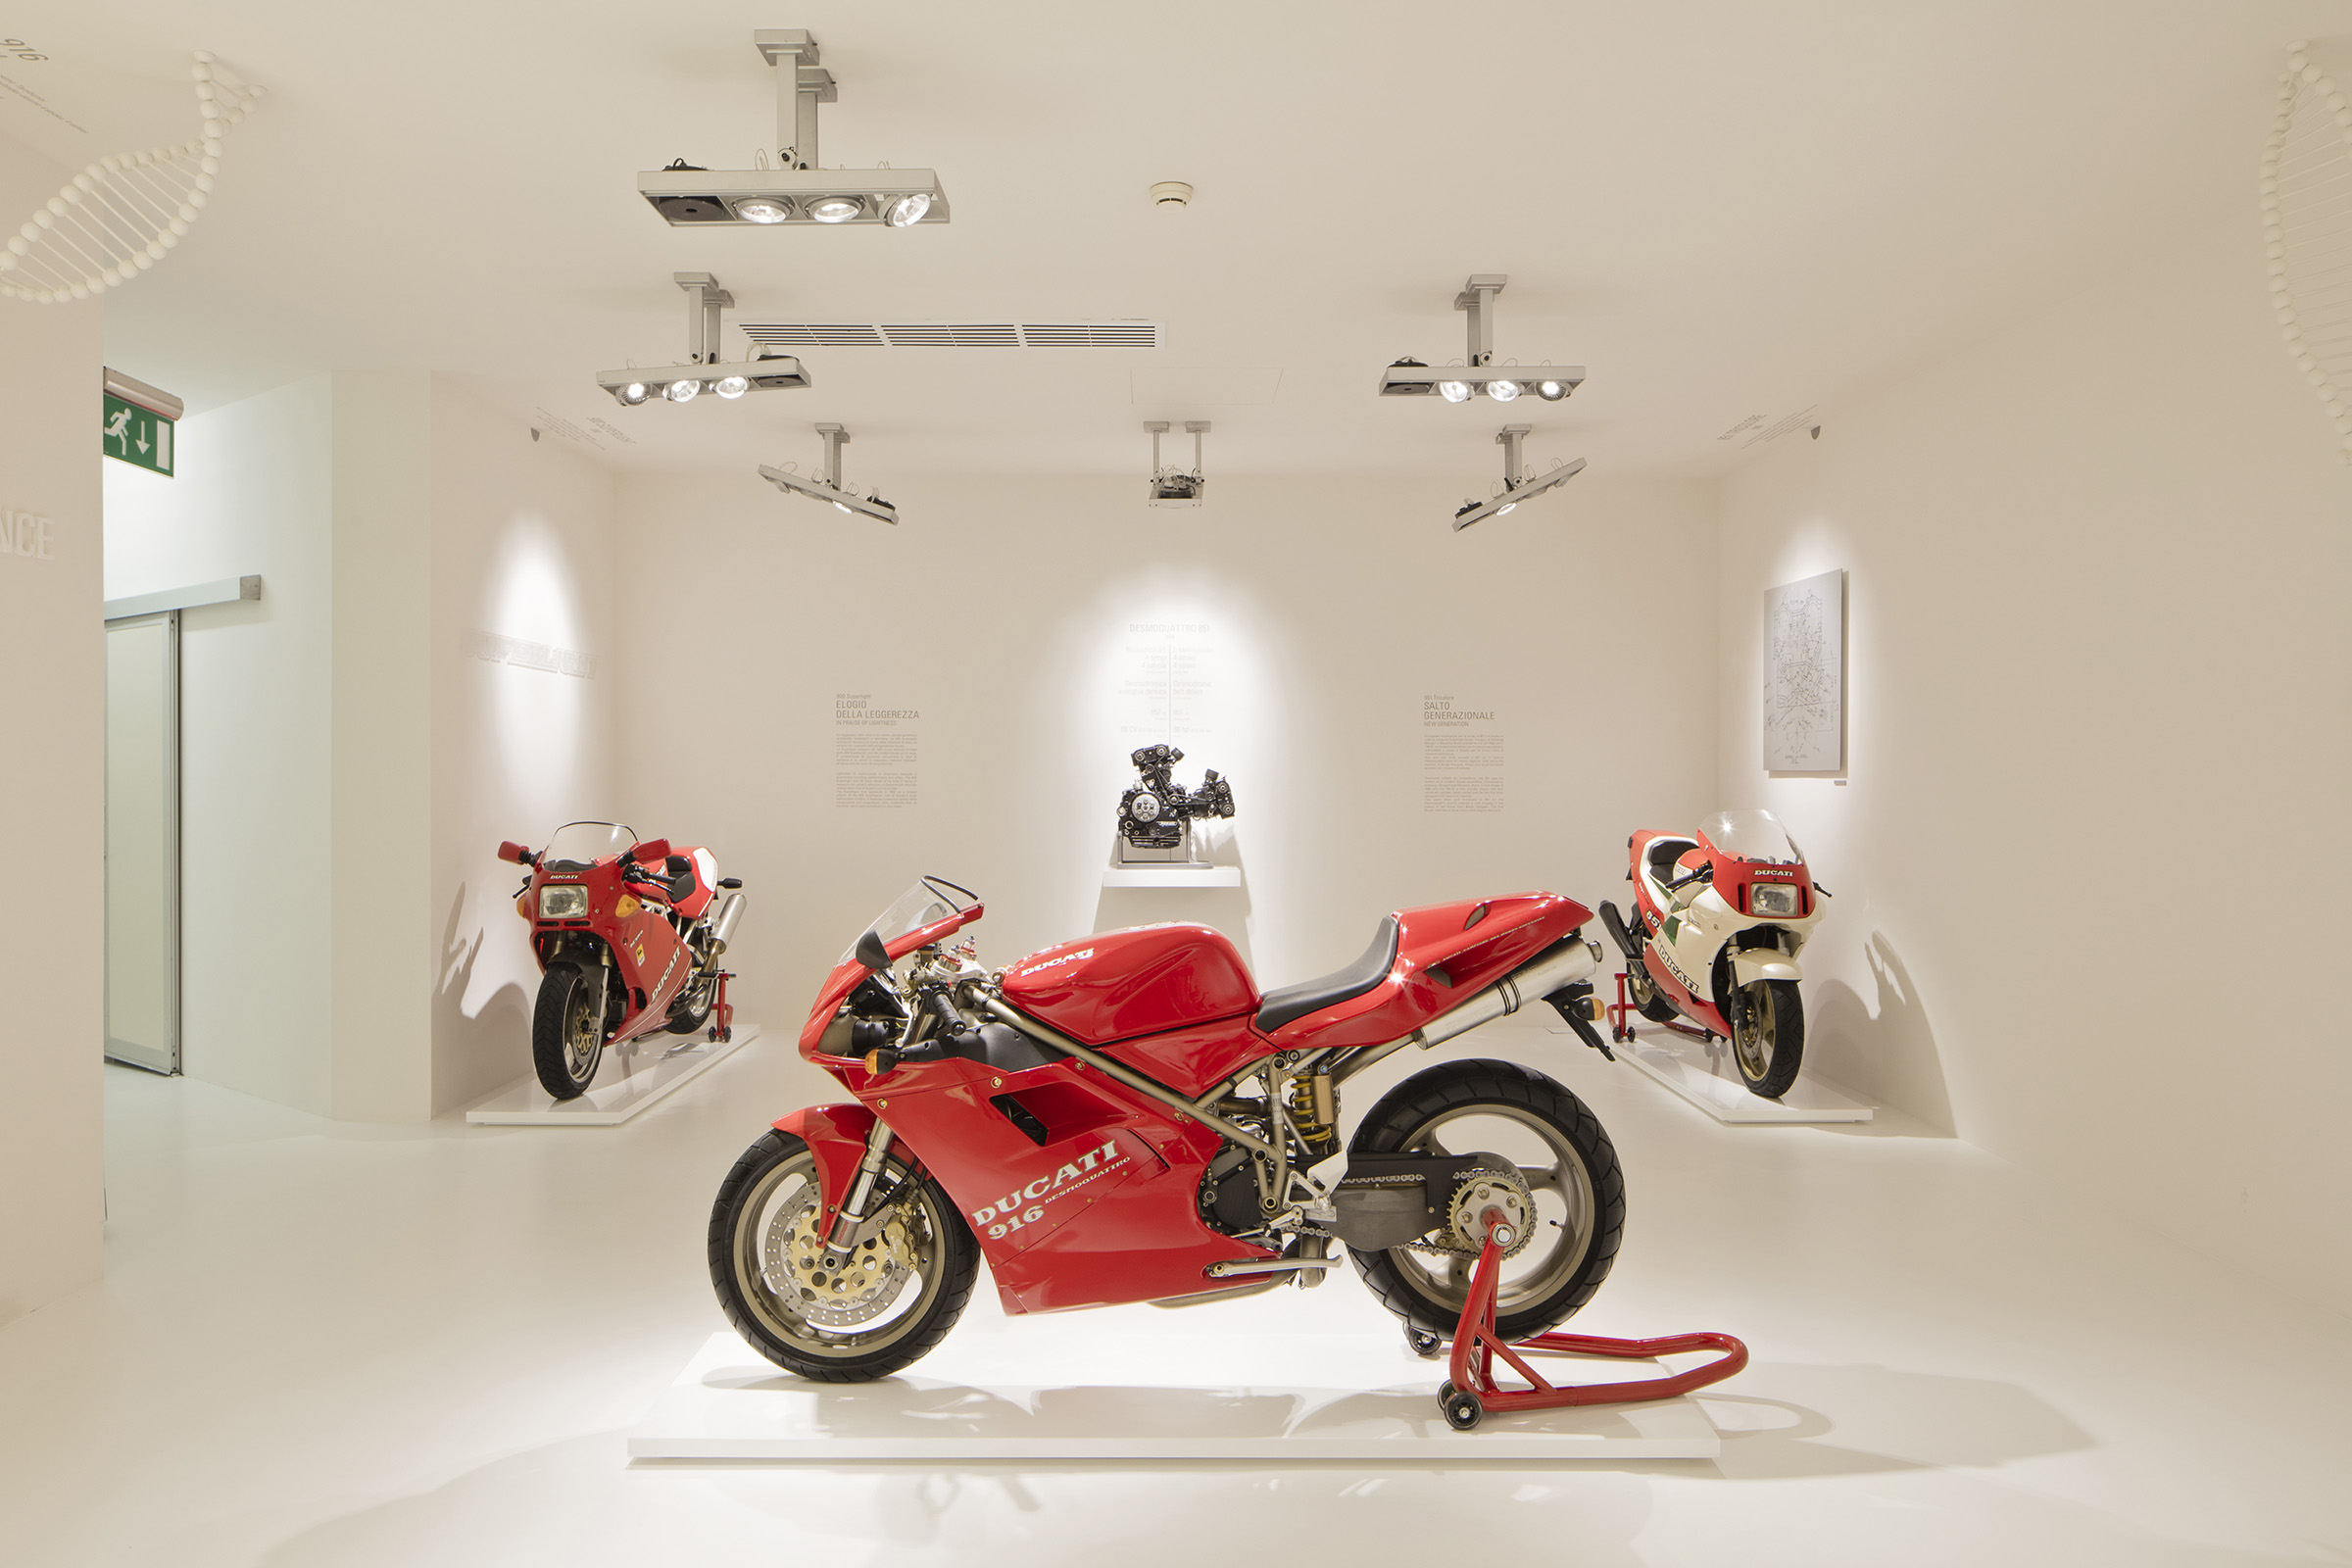 Online Journey: μια εικονική περιήγηση στο Μουσείο Ducati!